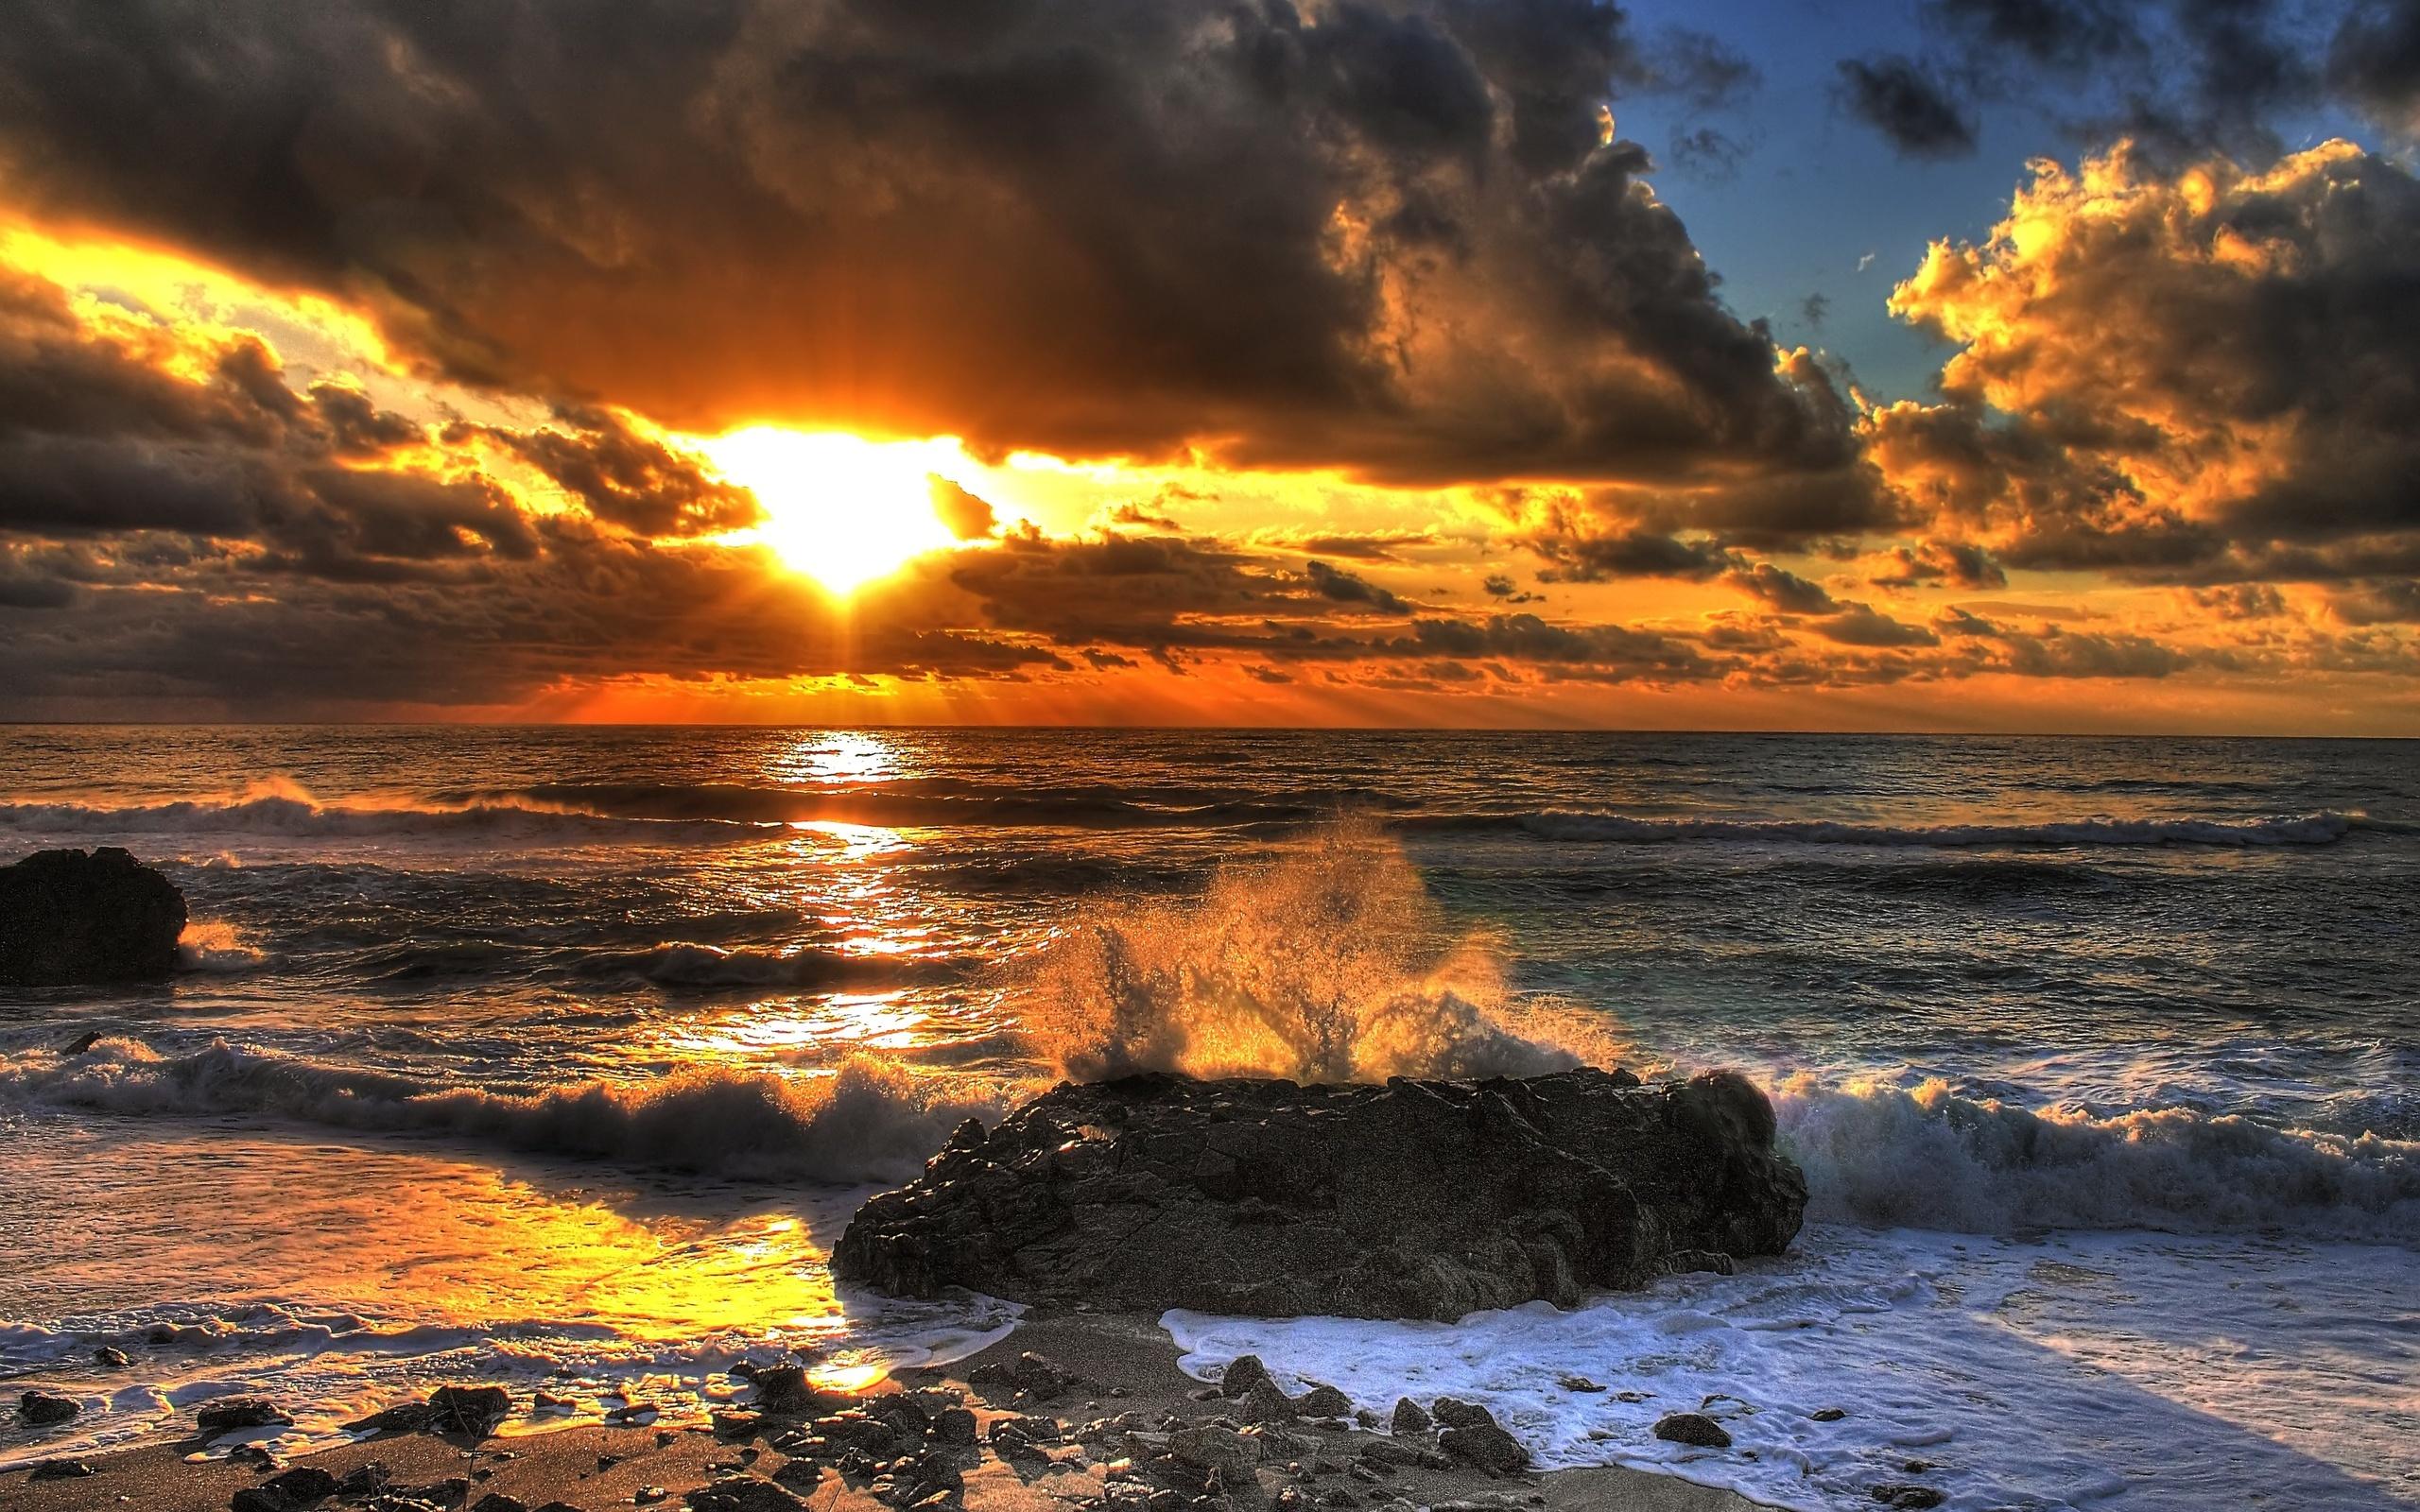 Sea Sunset Landscape Oceran Waves Beaches Wallpaper